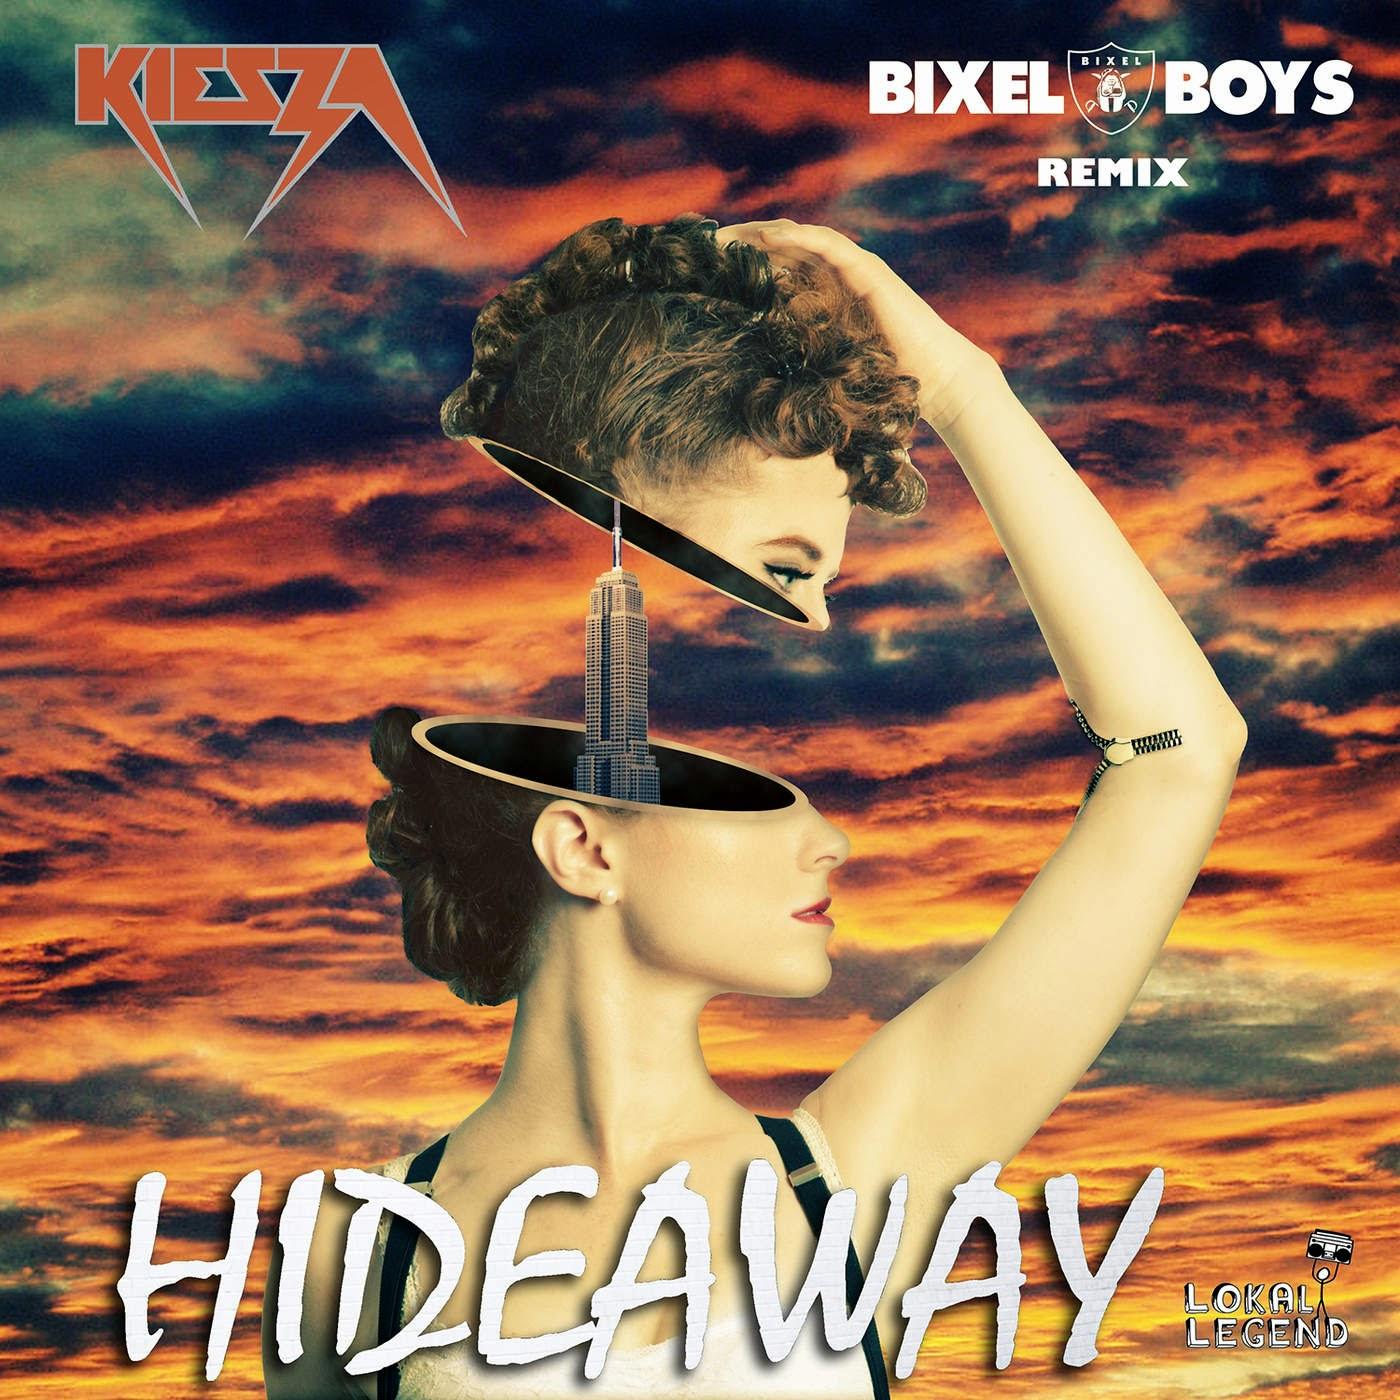 Kiesza - Hideaway (Bixel Boys Remix) - Single Cover